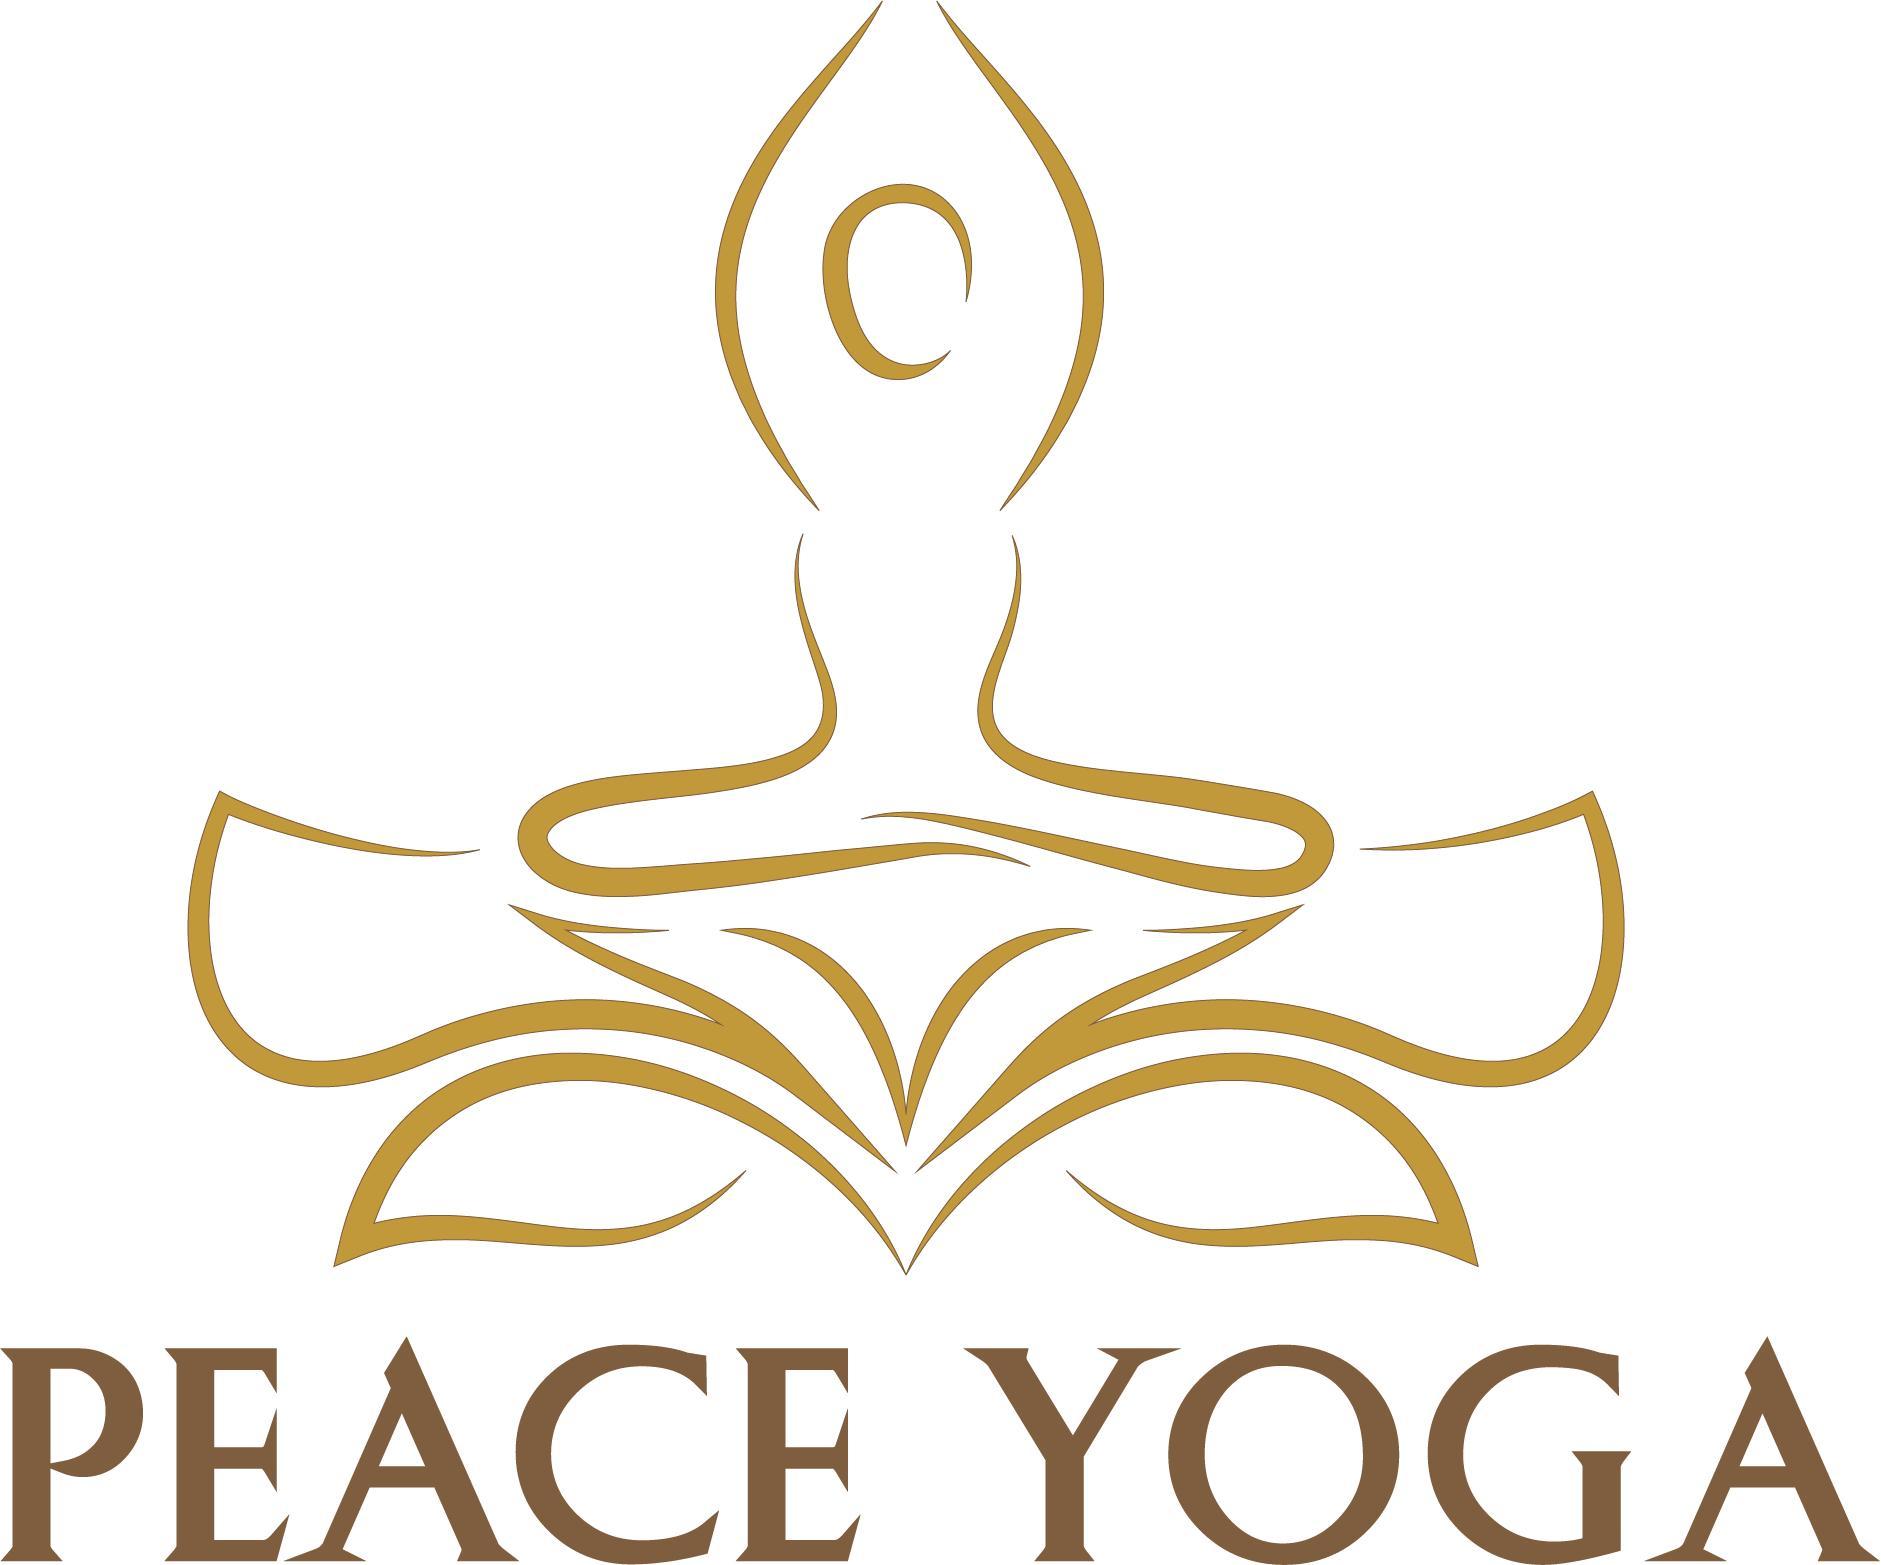 GIỚI THIỆU CLB PEACE YOGA QUẬN 6